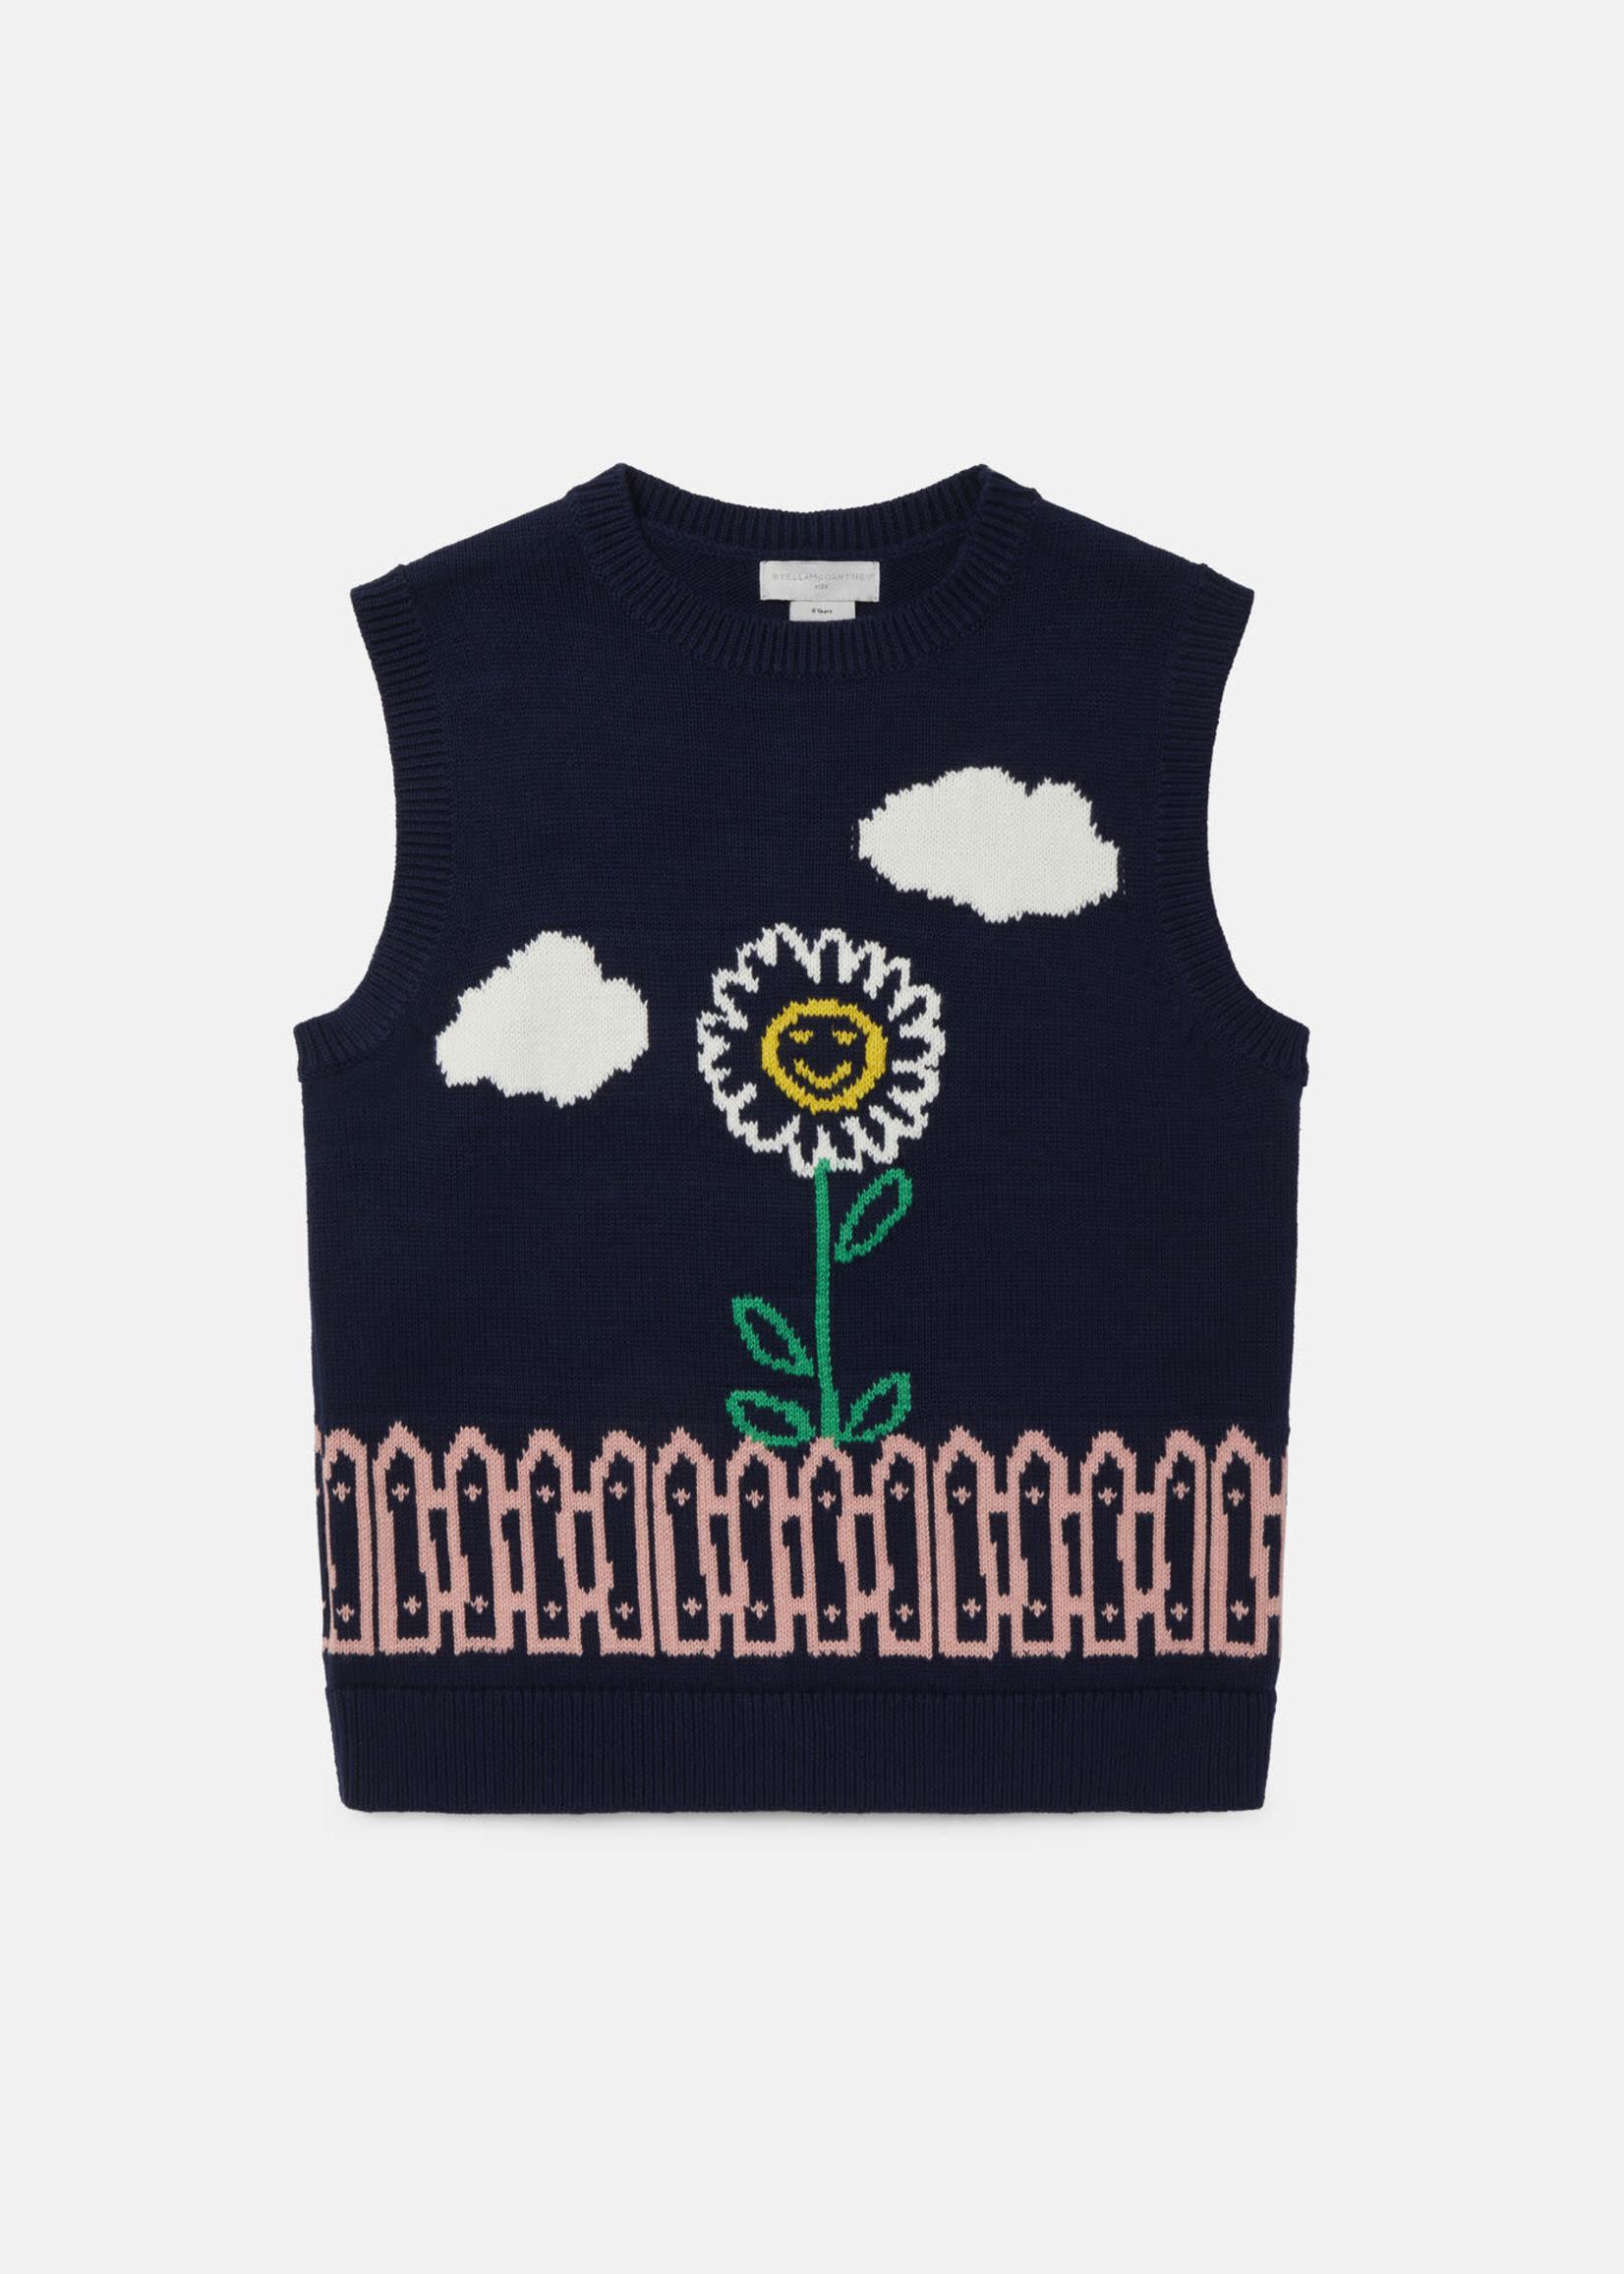 Stella McCartney Stella Mccartney-AW21 603453 Garden Knit Intarsia Gilet